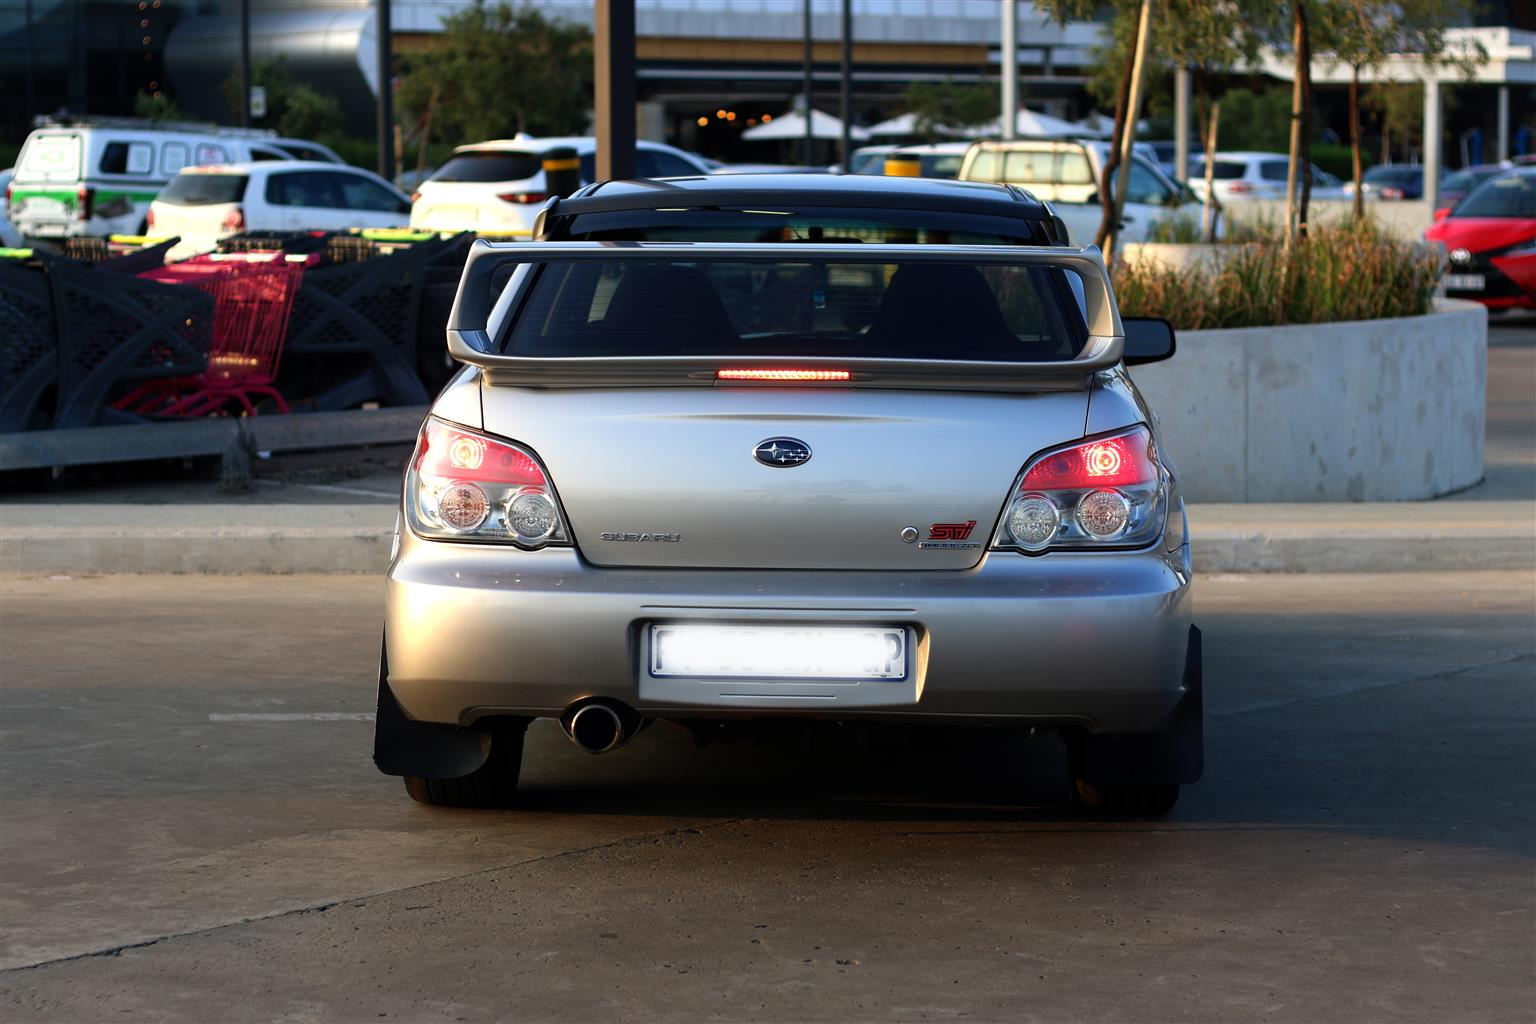 2007 Subaru Impreza Wrx >> 2007 Subaru Impreza Wrx Sti Junk Mail